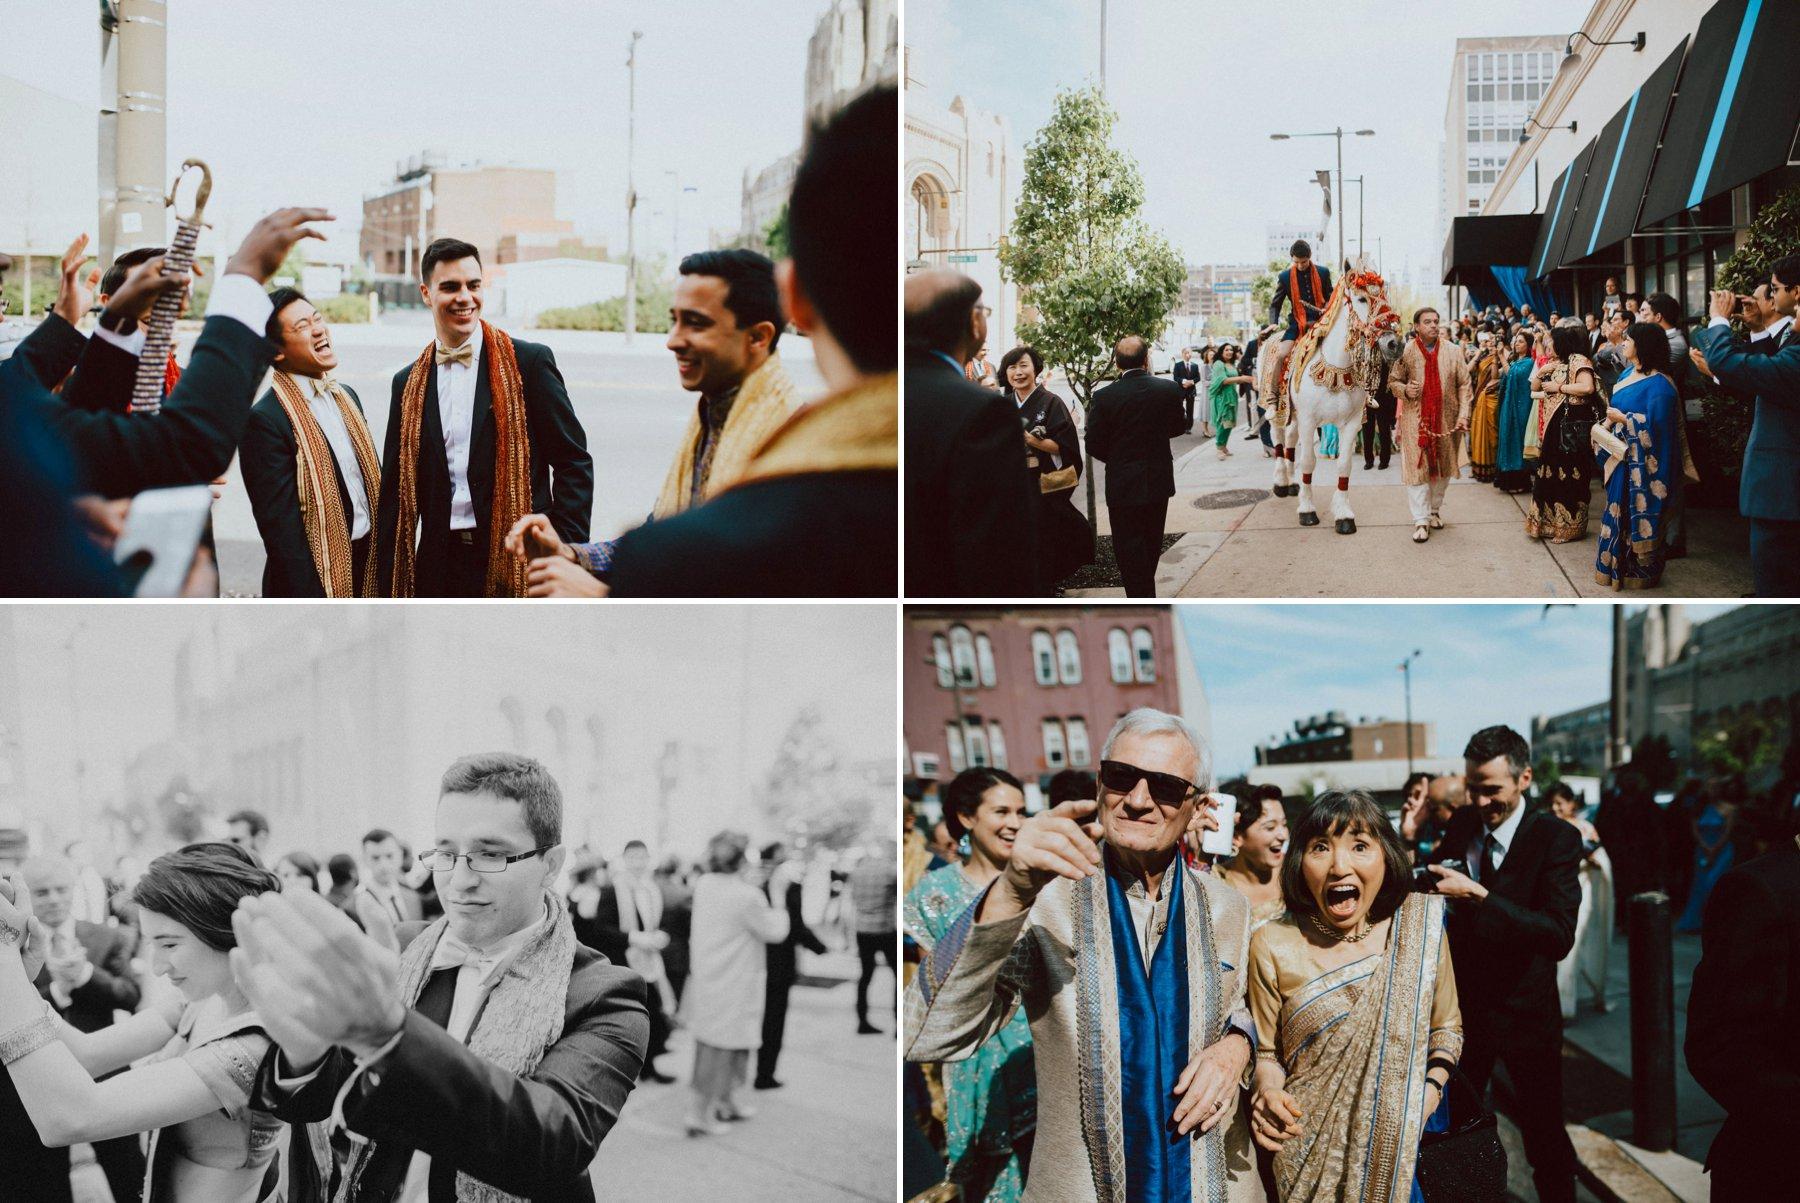 vie-philadelphia-indian-wedding-52.jpg